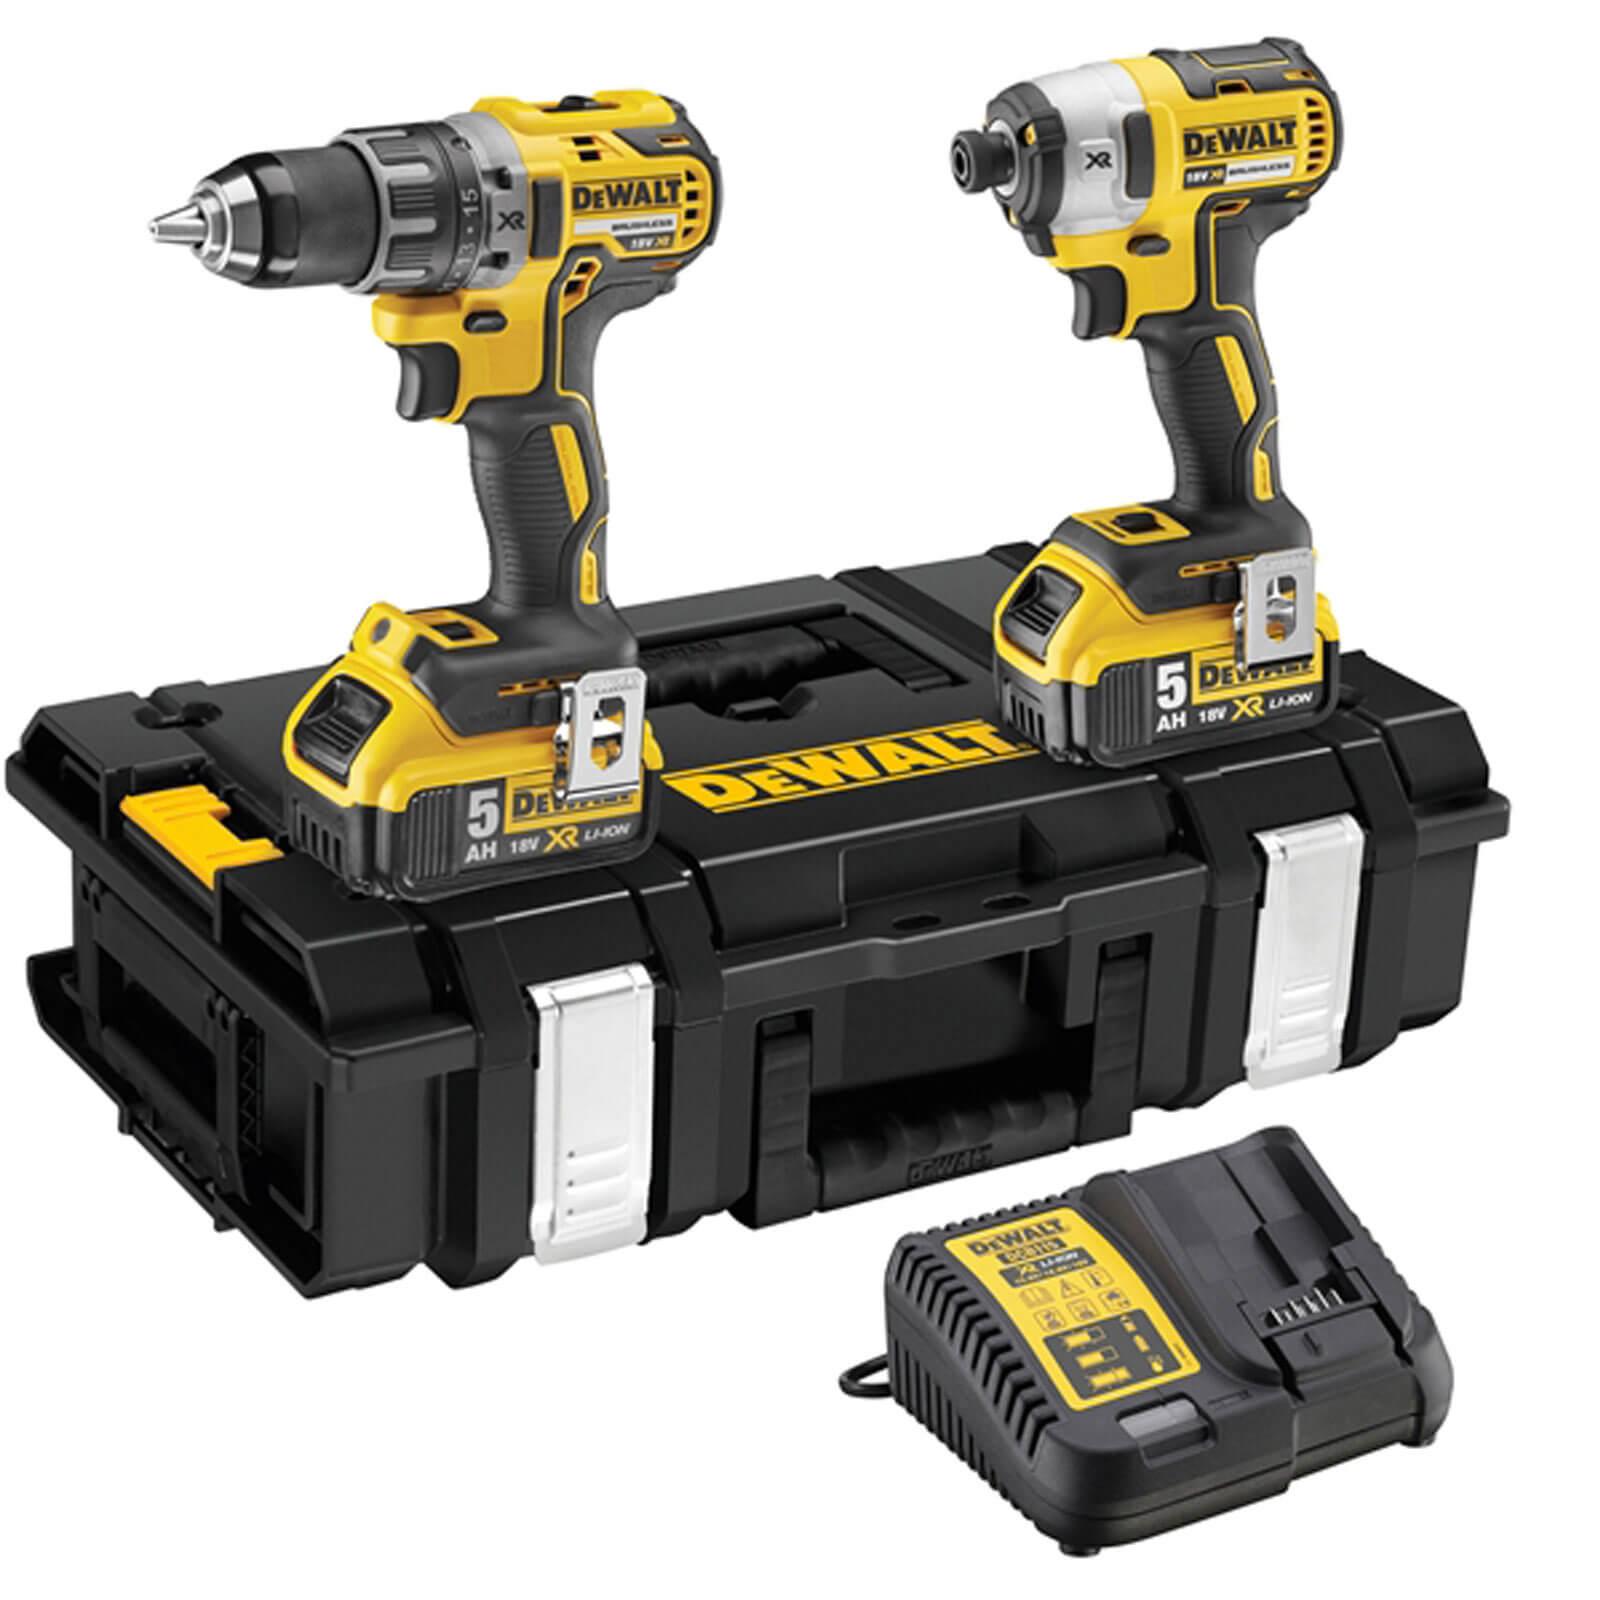 DeWalt DCK266P2 18v Cordless XR Brushless Combi Drill & Impact Driver with 2 Liion Batteries 5ah